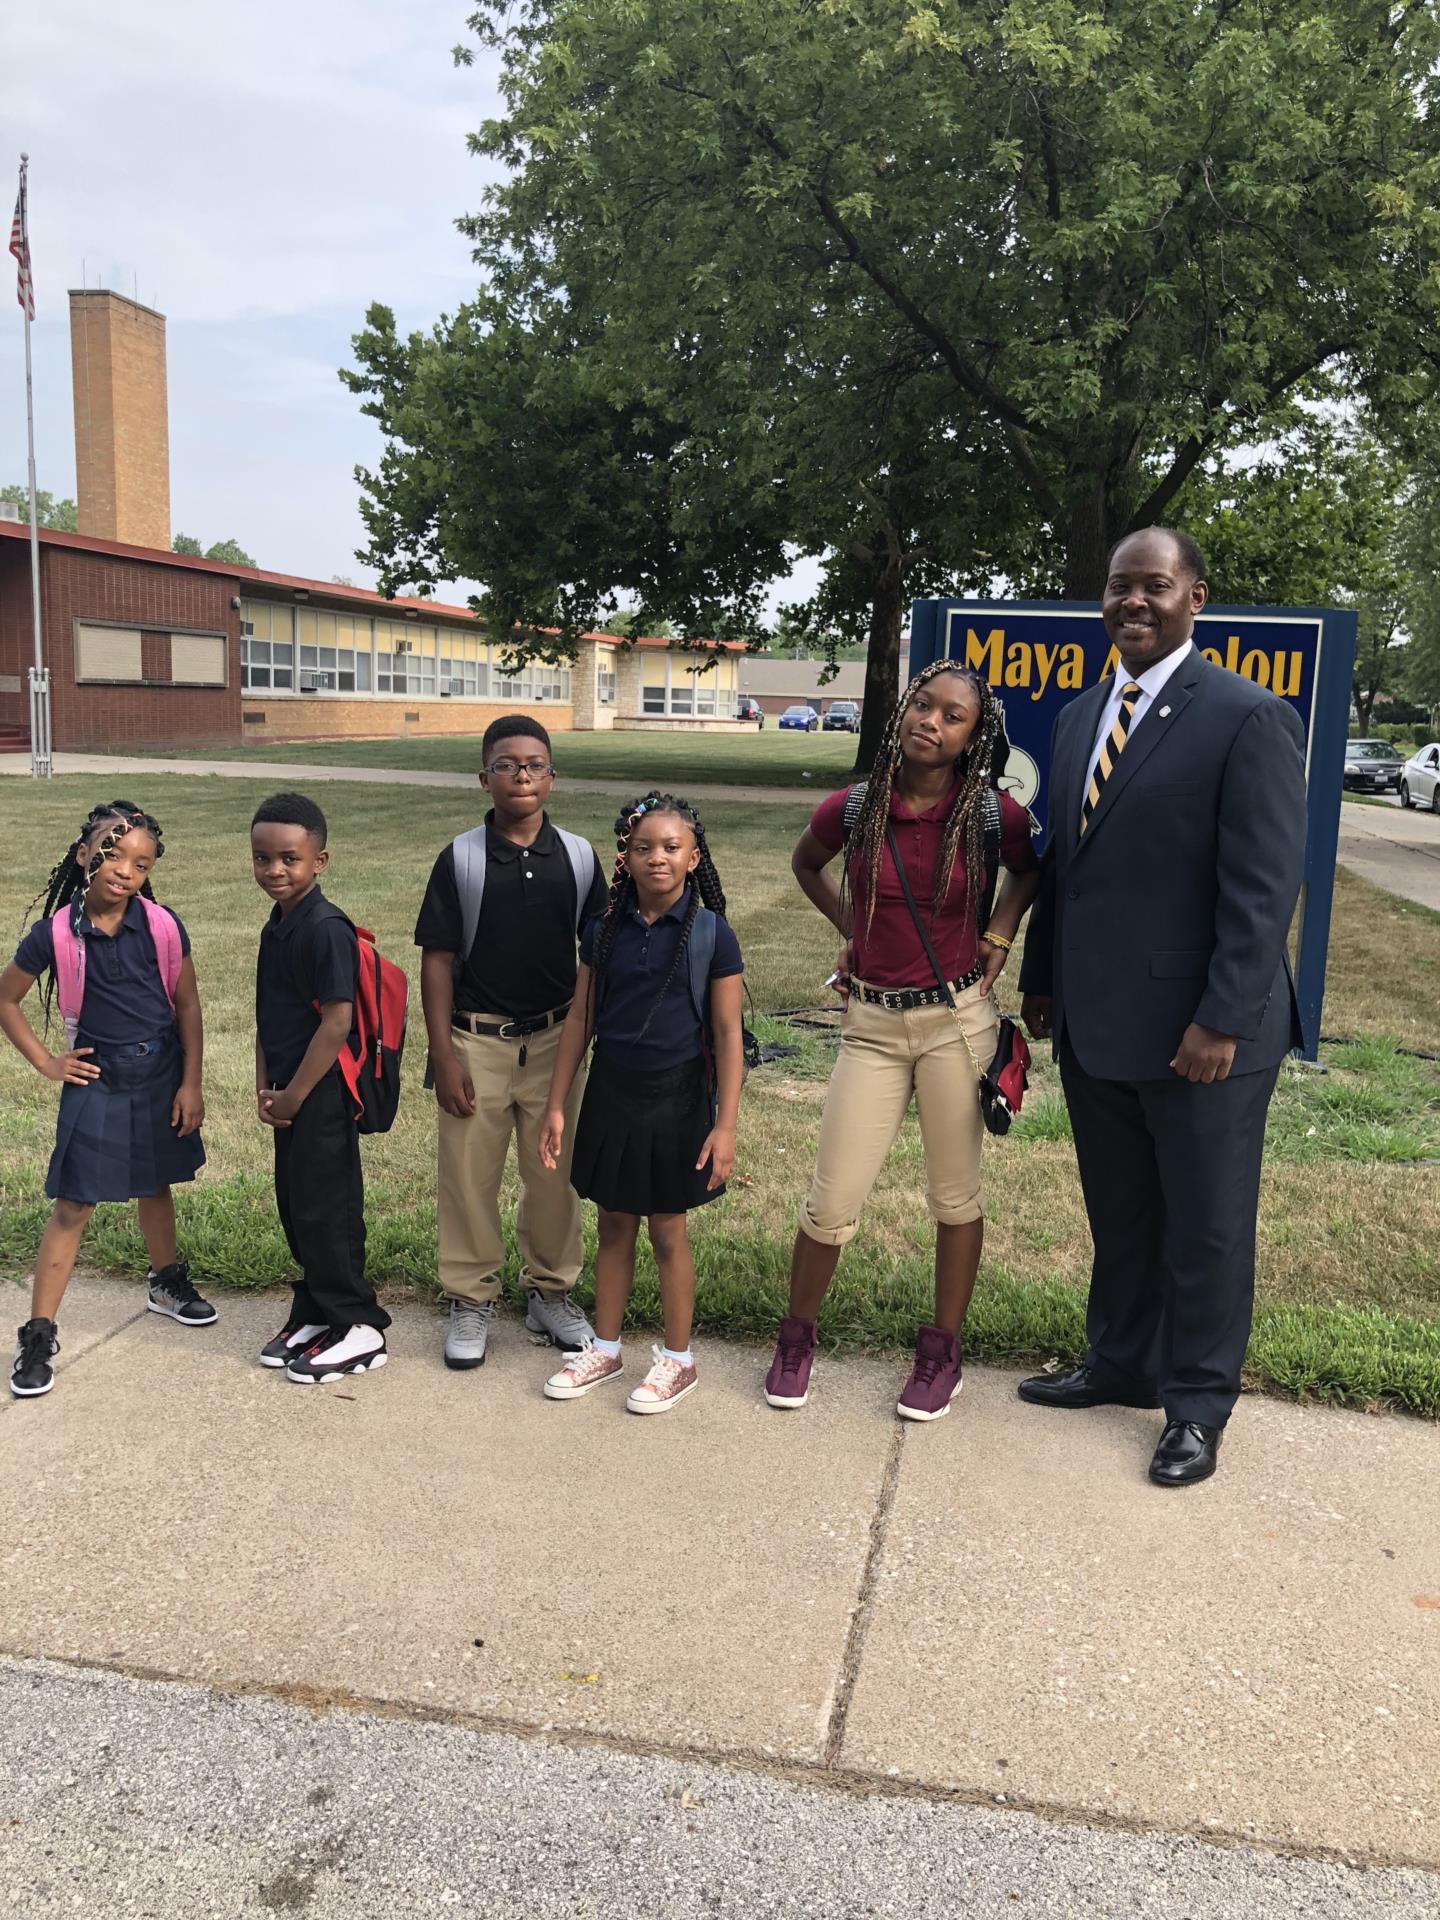 harvey school district 152